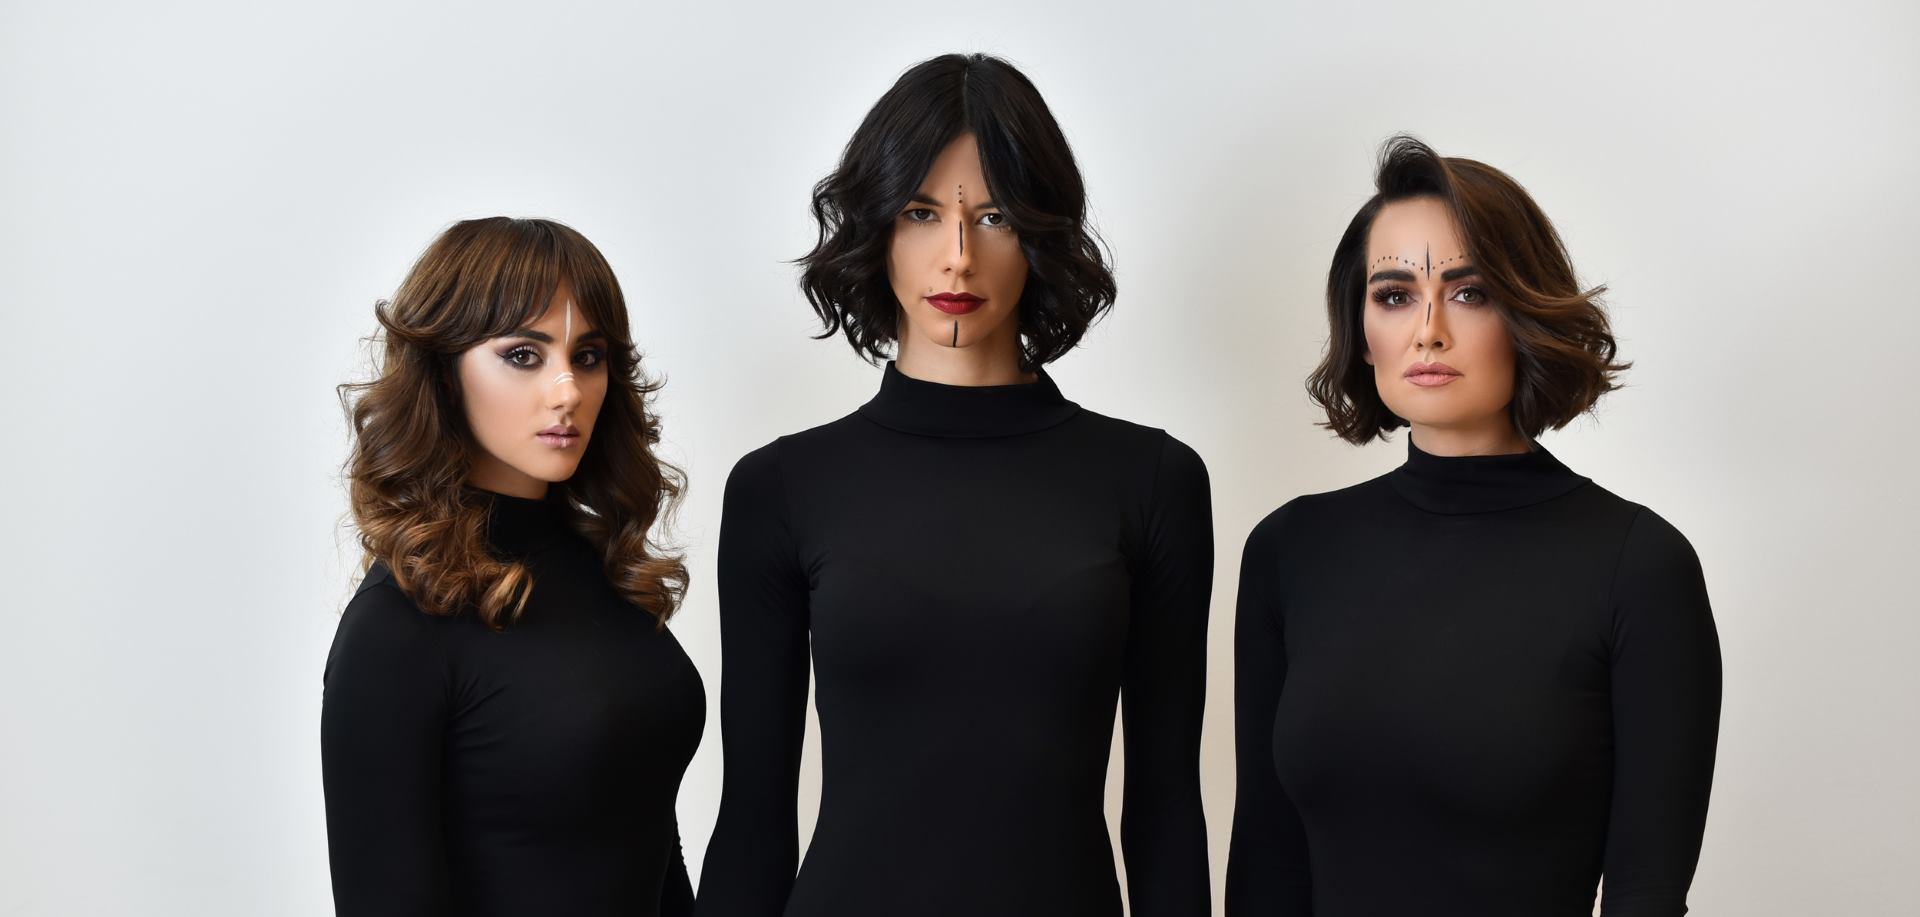 FOTO: BOHEMIAN TRIBE BEAUTY CONCEPT Otvoren novi splitski beauty salon jedinstvenog koncepta